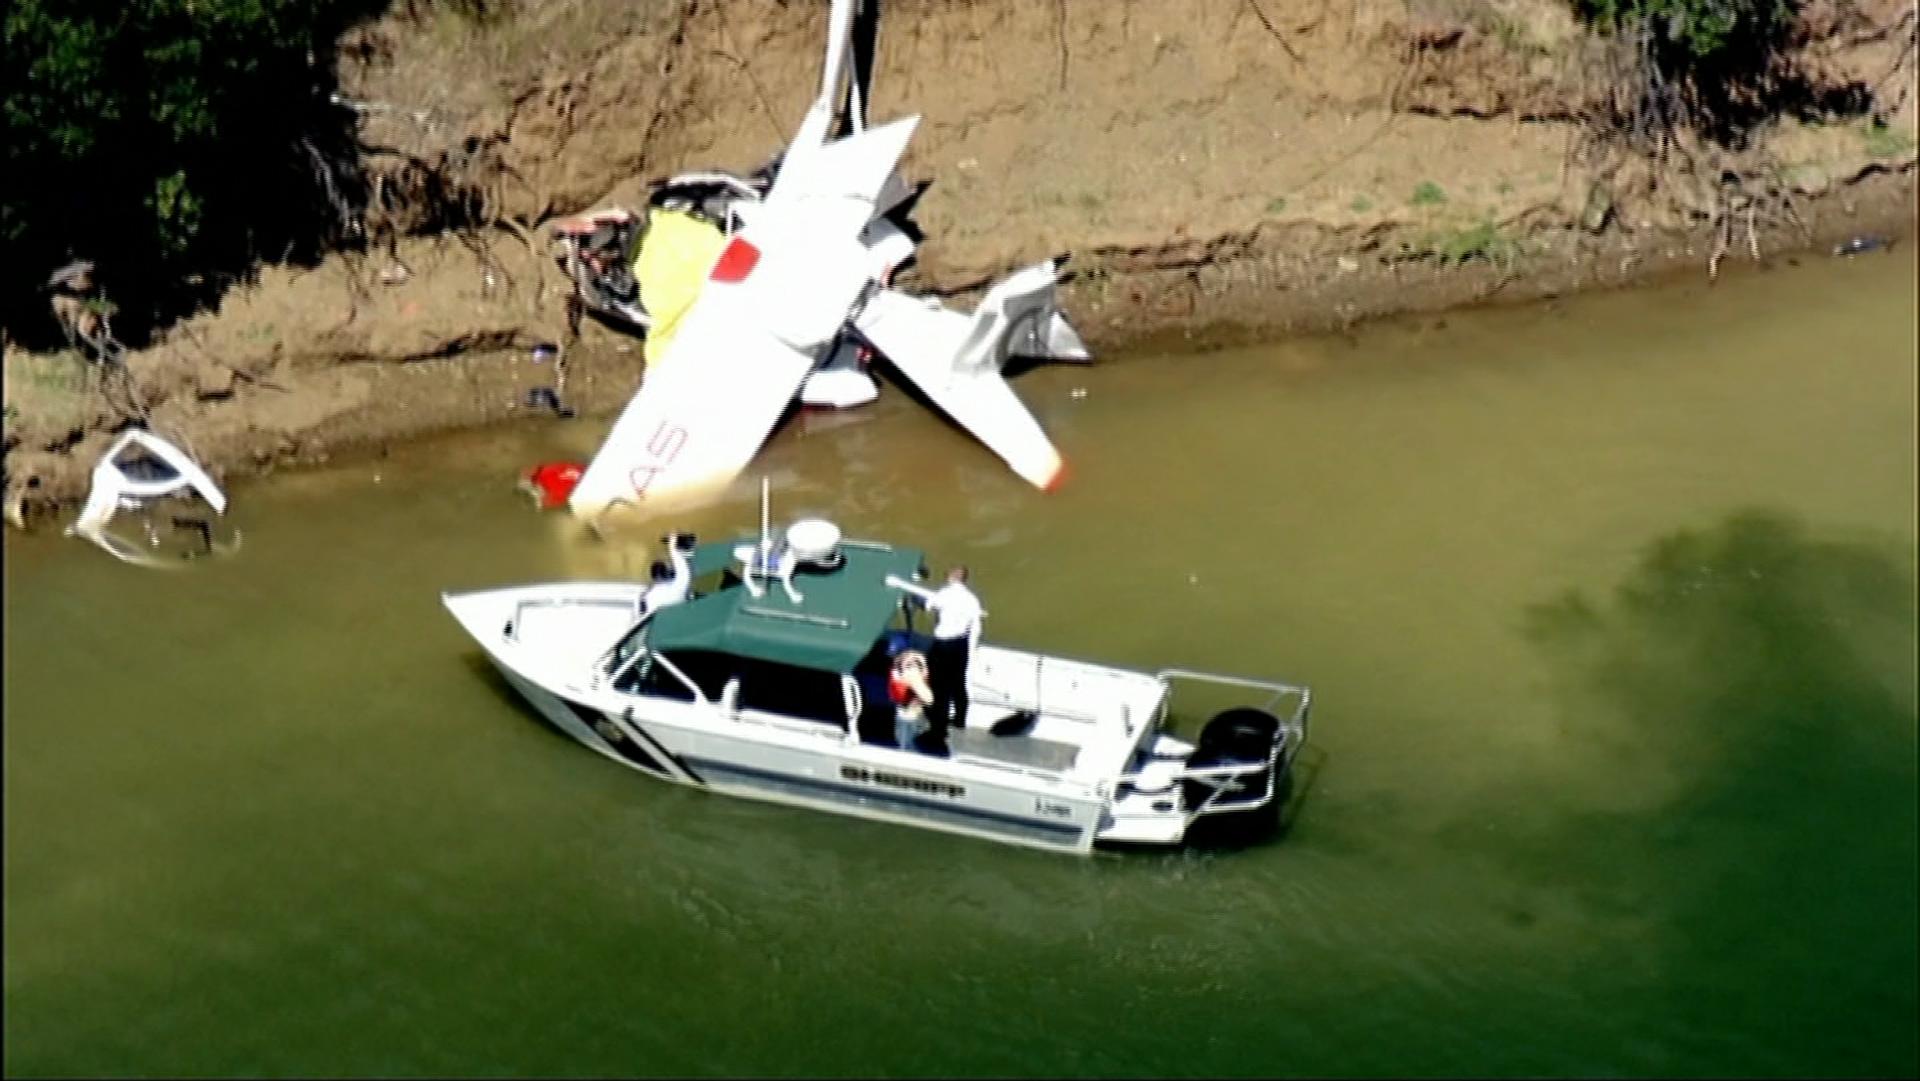 Lake Beryessa plane crash